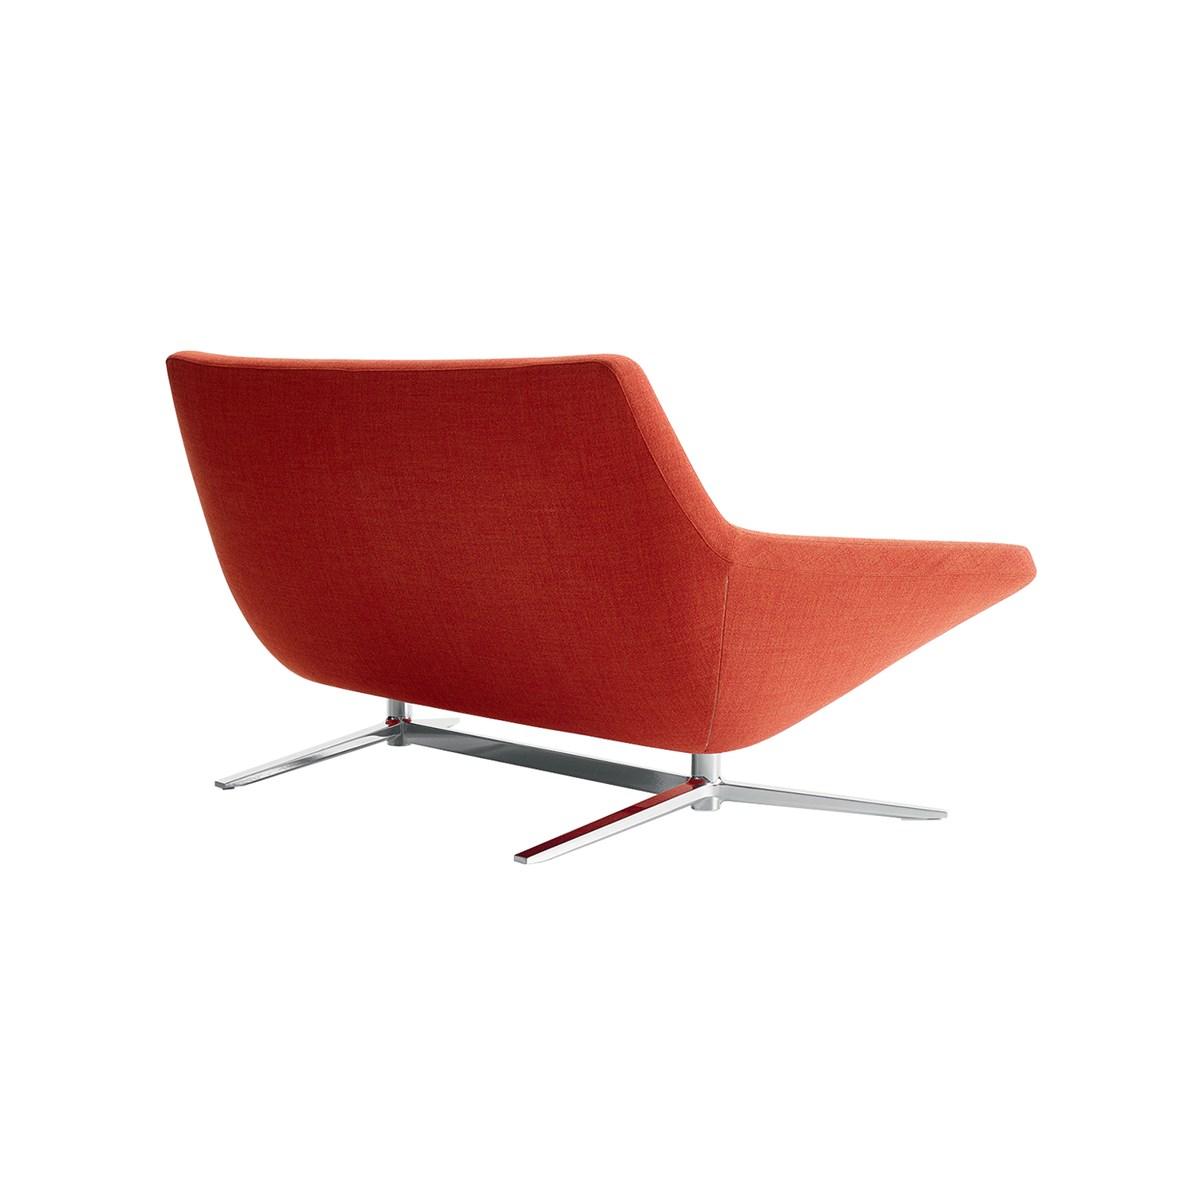 B&B-Italia-Jeffrey-Bernett-Metropolitan-Sofa-Matisse-2